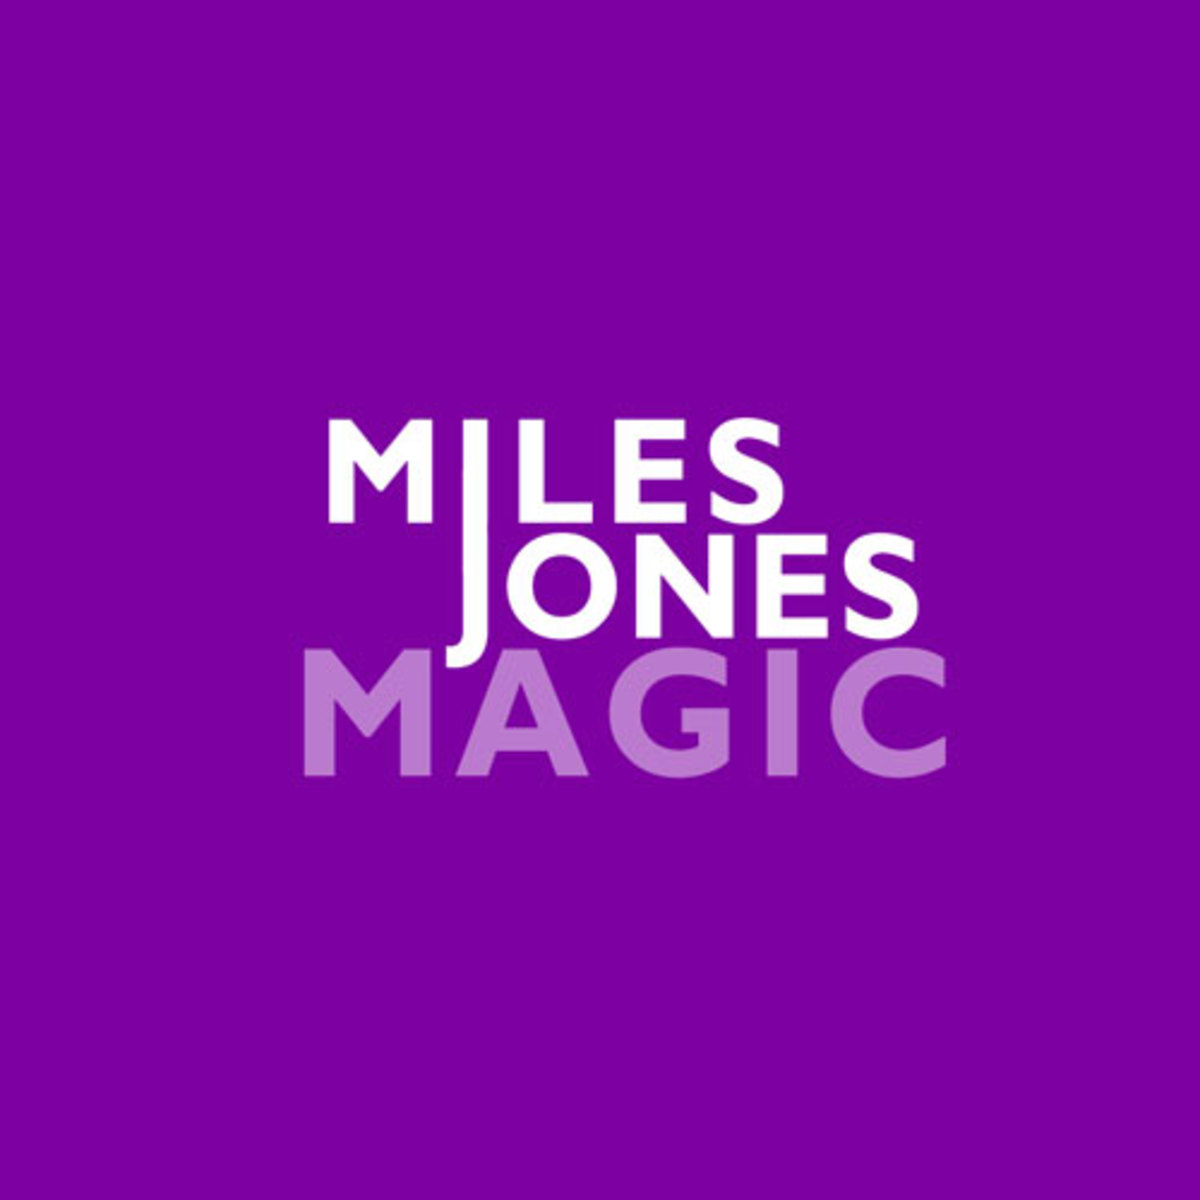 milesjones-magic.jpg